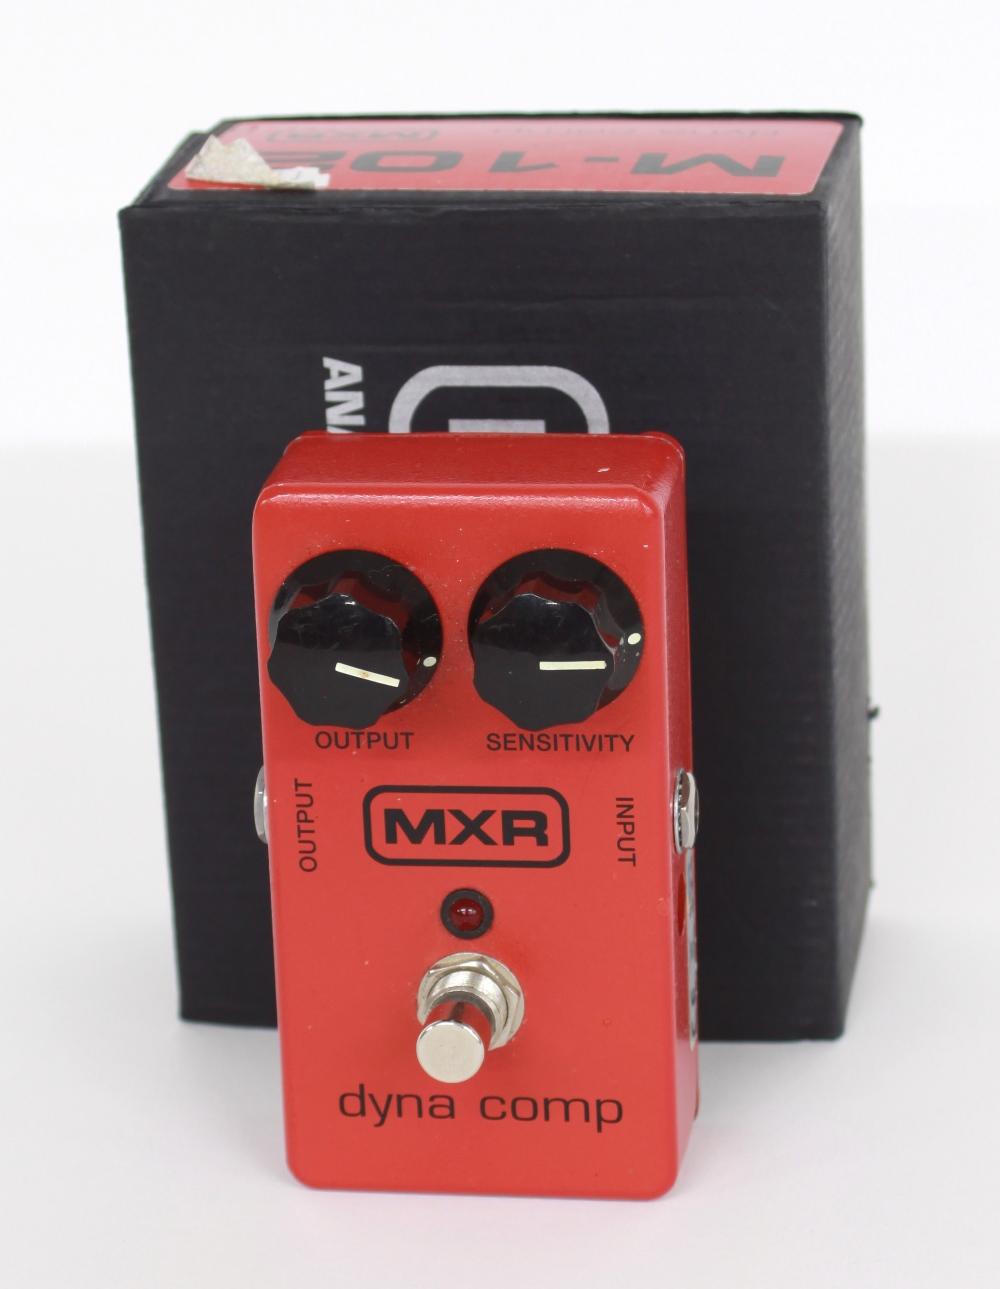 MXR Dyna Comp compressor guitar pedal, boxed